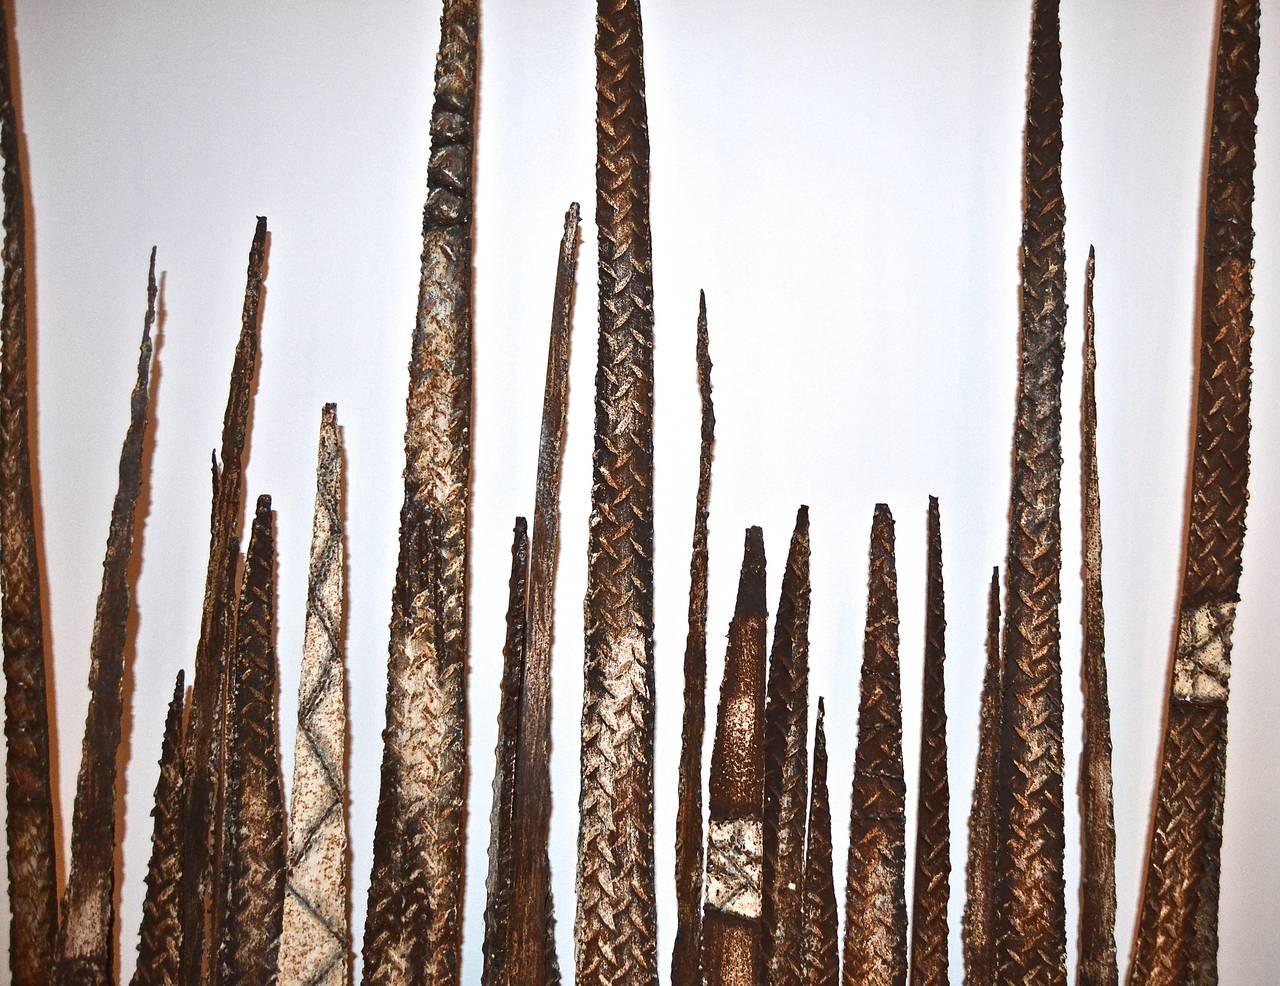 Brutalist Paul Evans Stalagmite Floor Sculptures For Sale